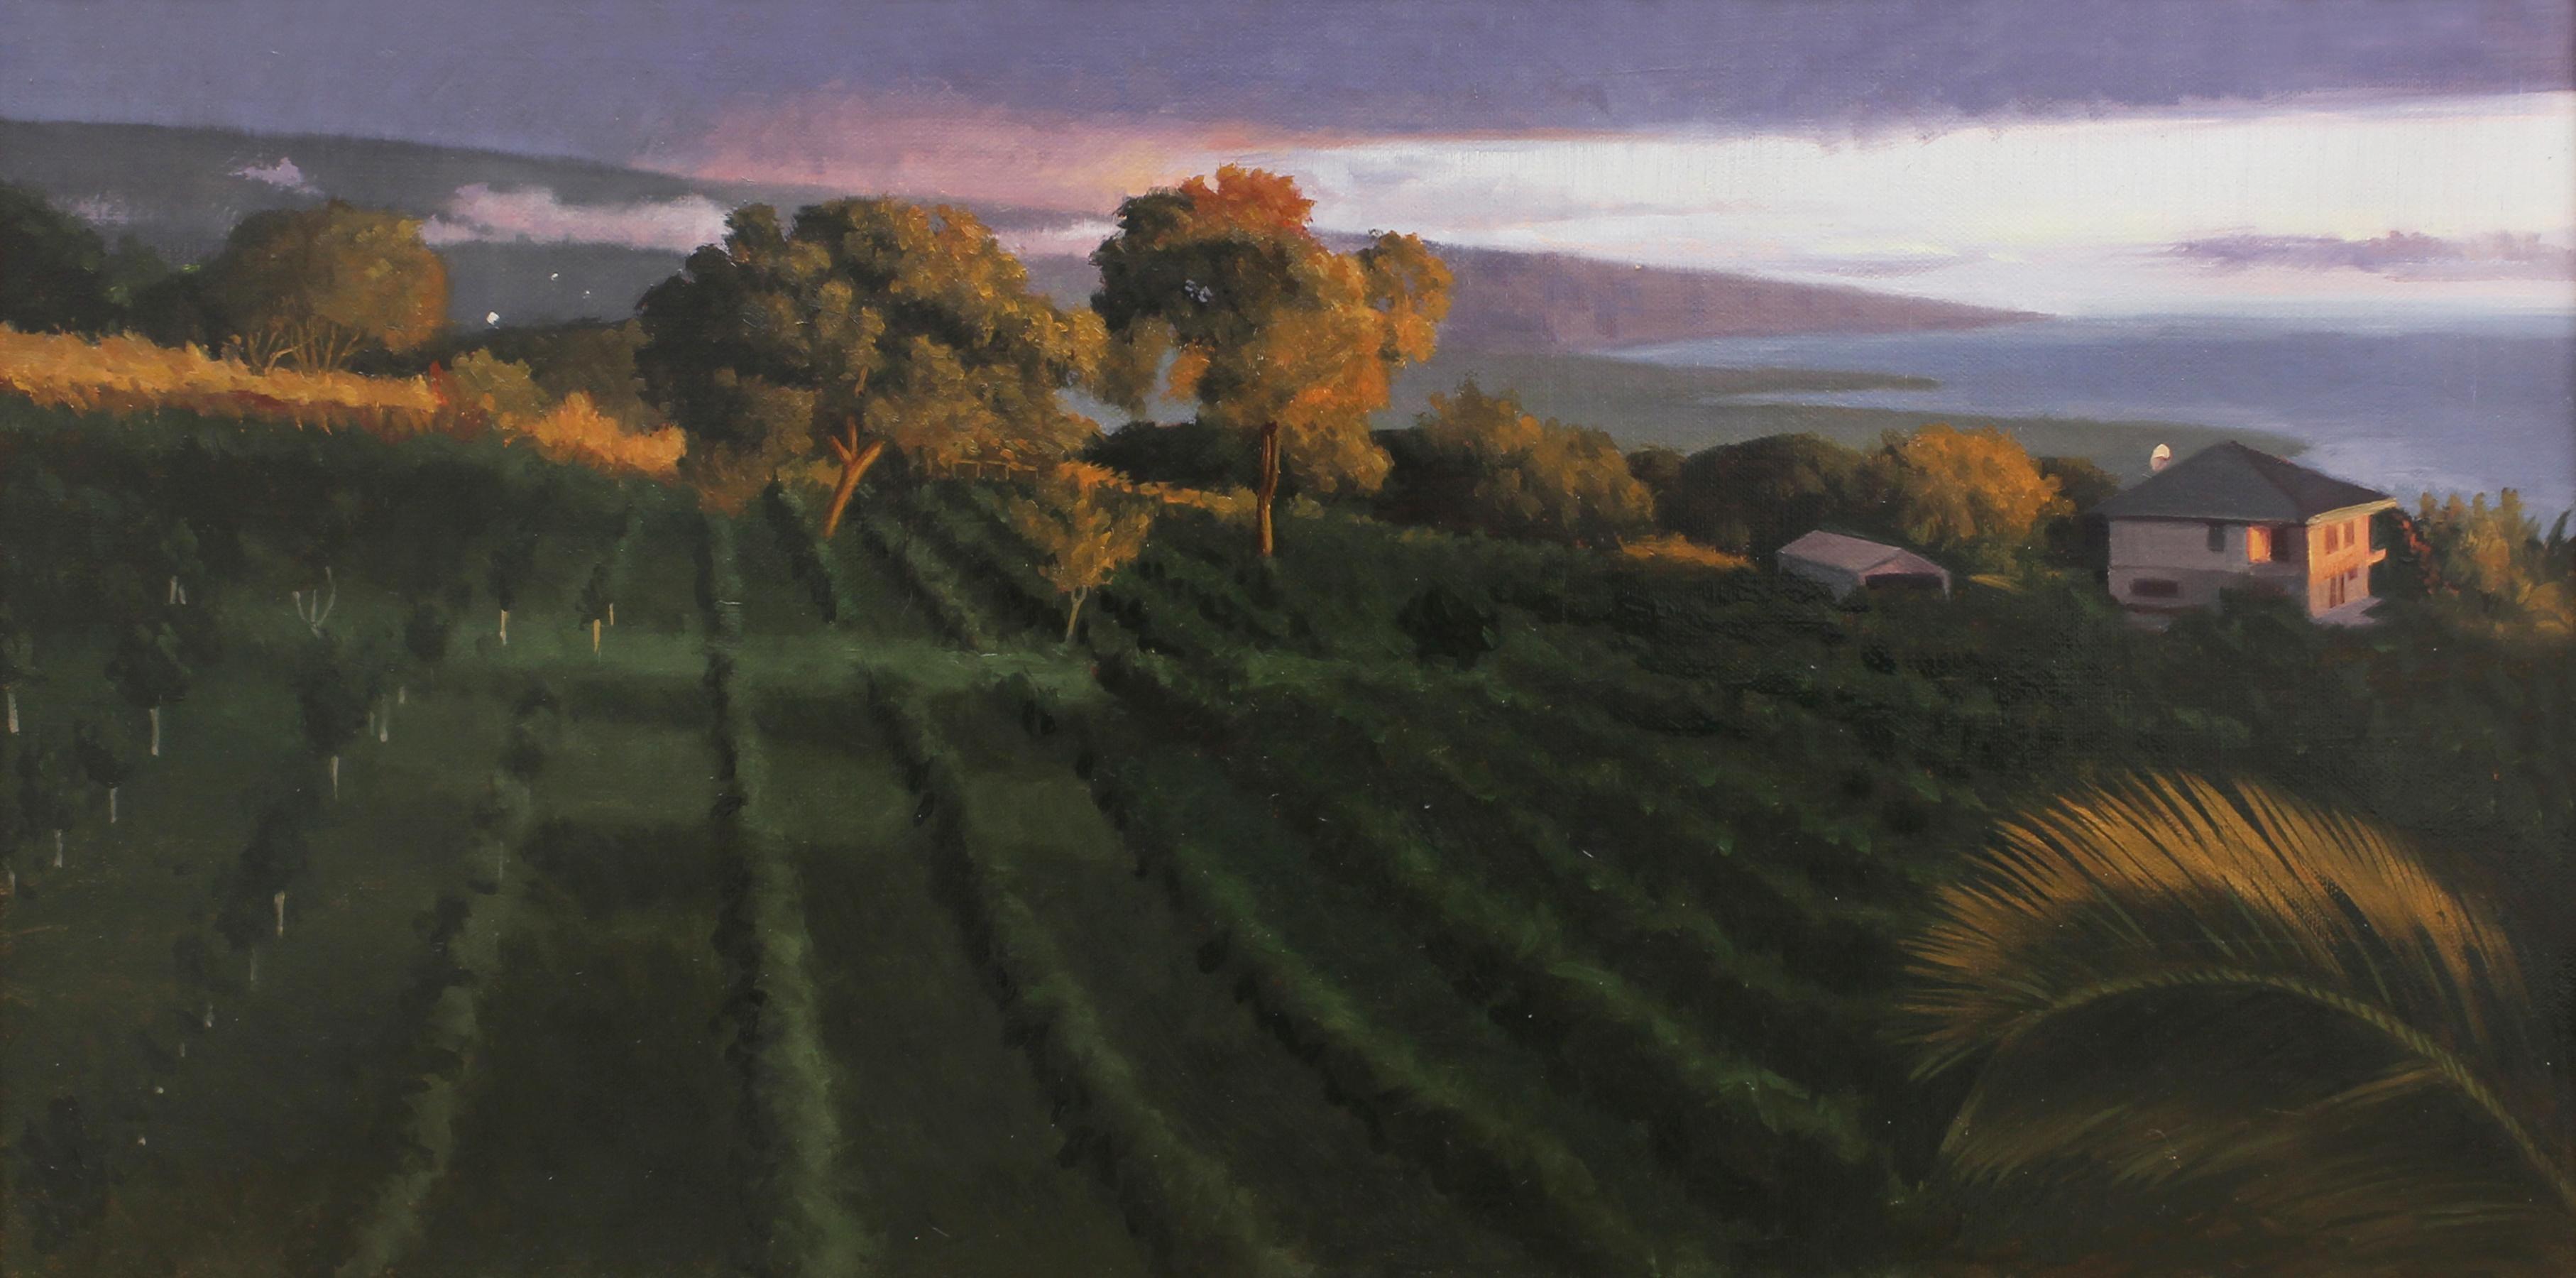 """Kona"" - Nocturne - Landscape Painting - American Realism - Wyeth"